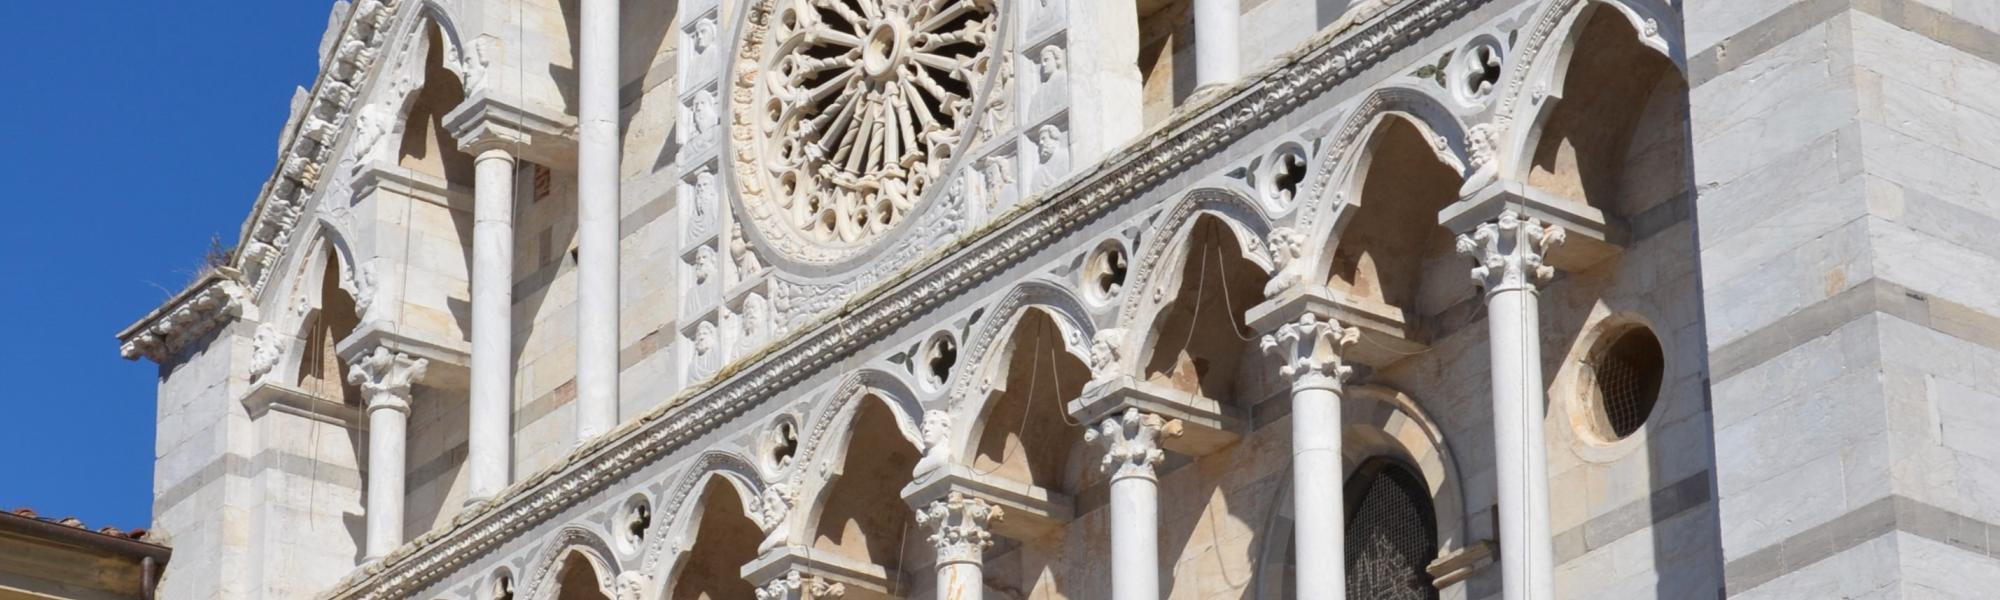 Facciata Chiesa di Santa Caterina (L. Corevi, Comune di Pisa)